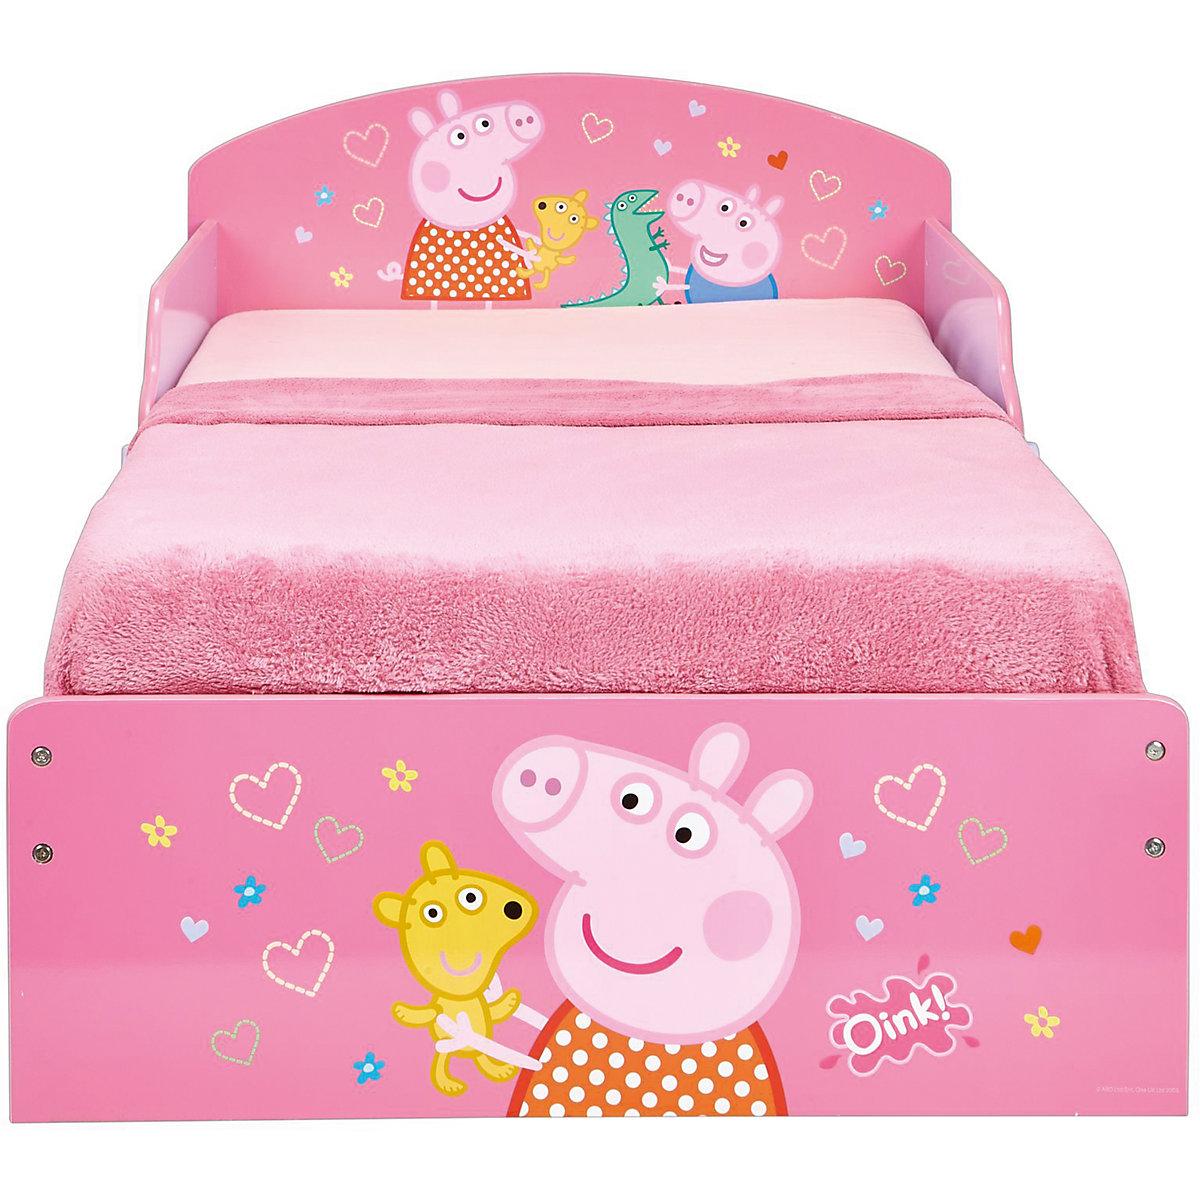 Kinderbett, Peppa Pig, rosa, 70 x 140 cm, Peppa Pig | myToys